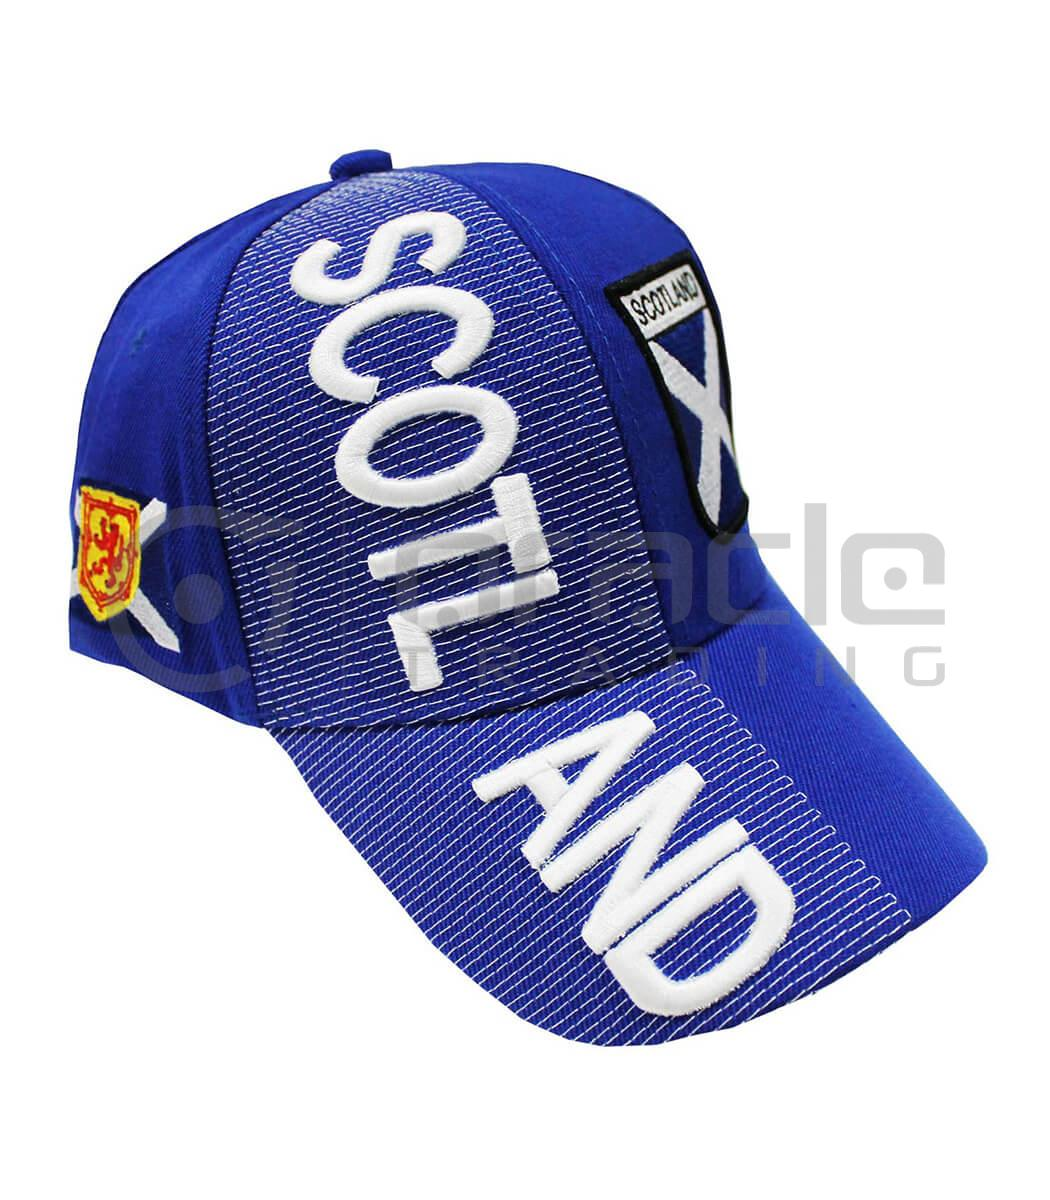 3D Scotland Hat - St. Andrew's Cross